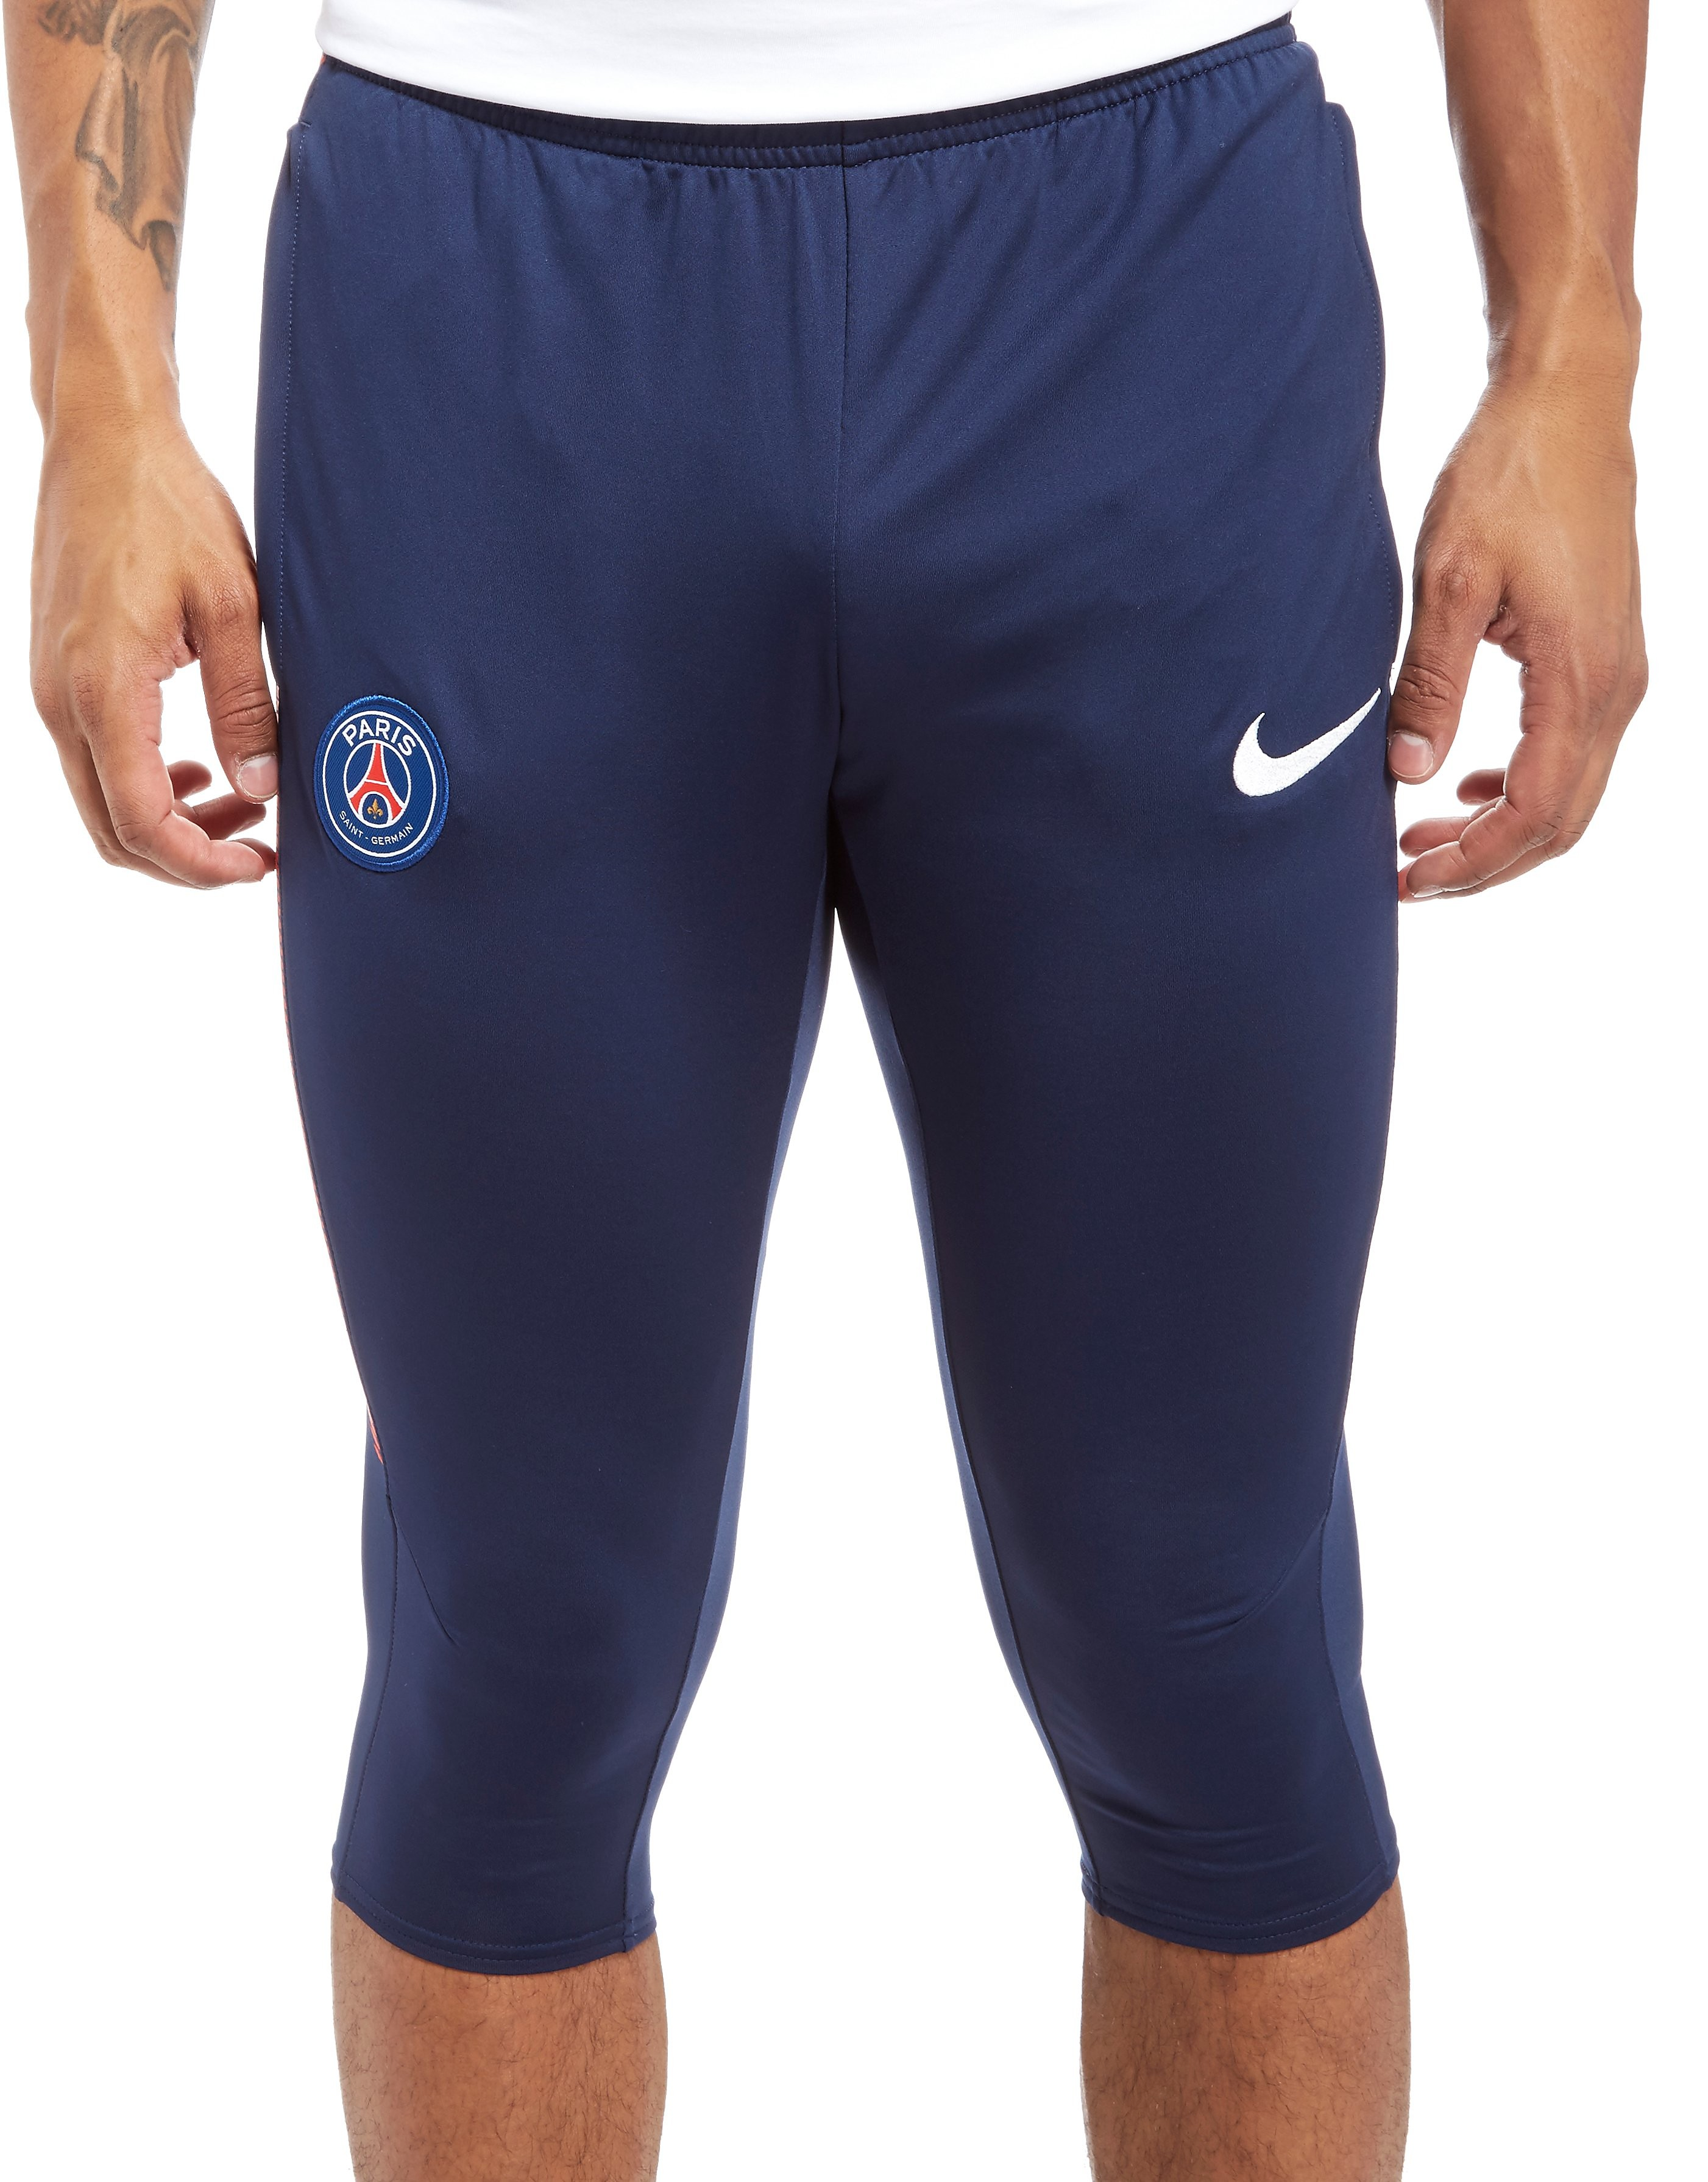 Nike pantalón pirata Paris Saint-Germain 2017/18 Squad 3/4